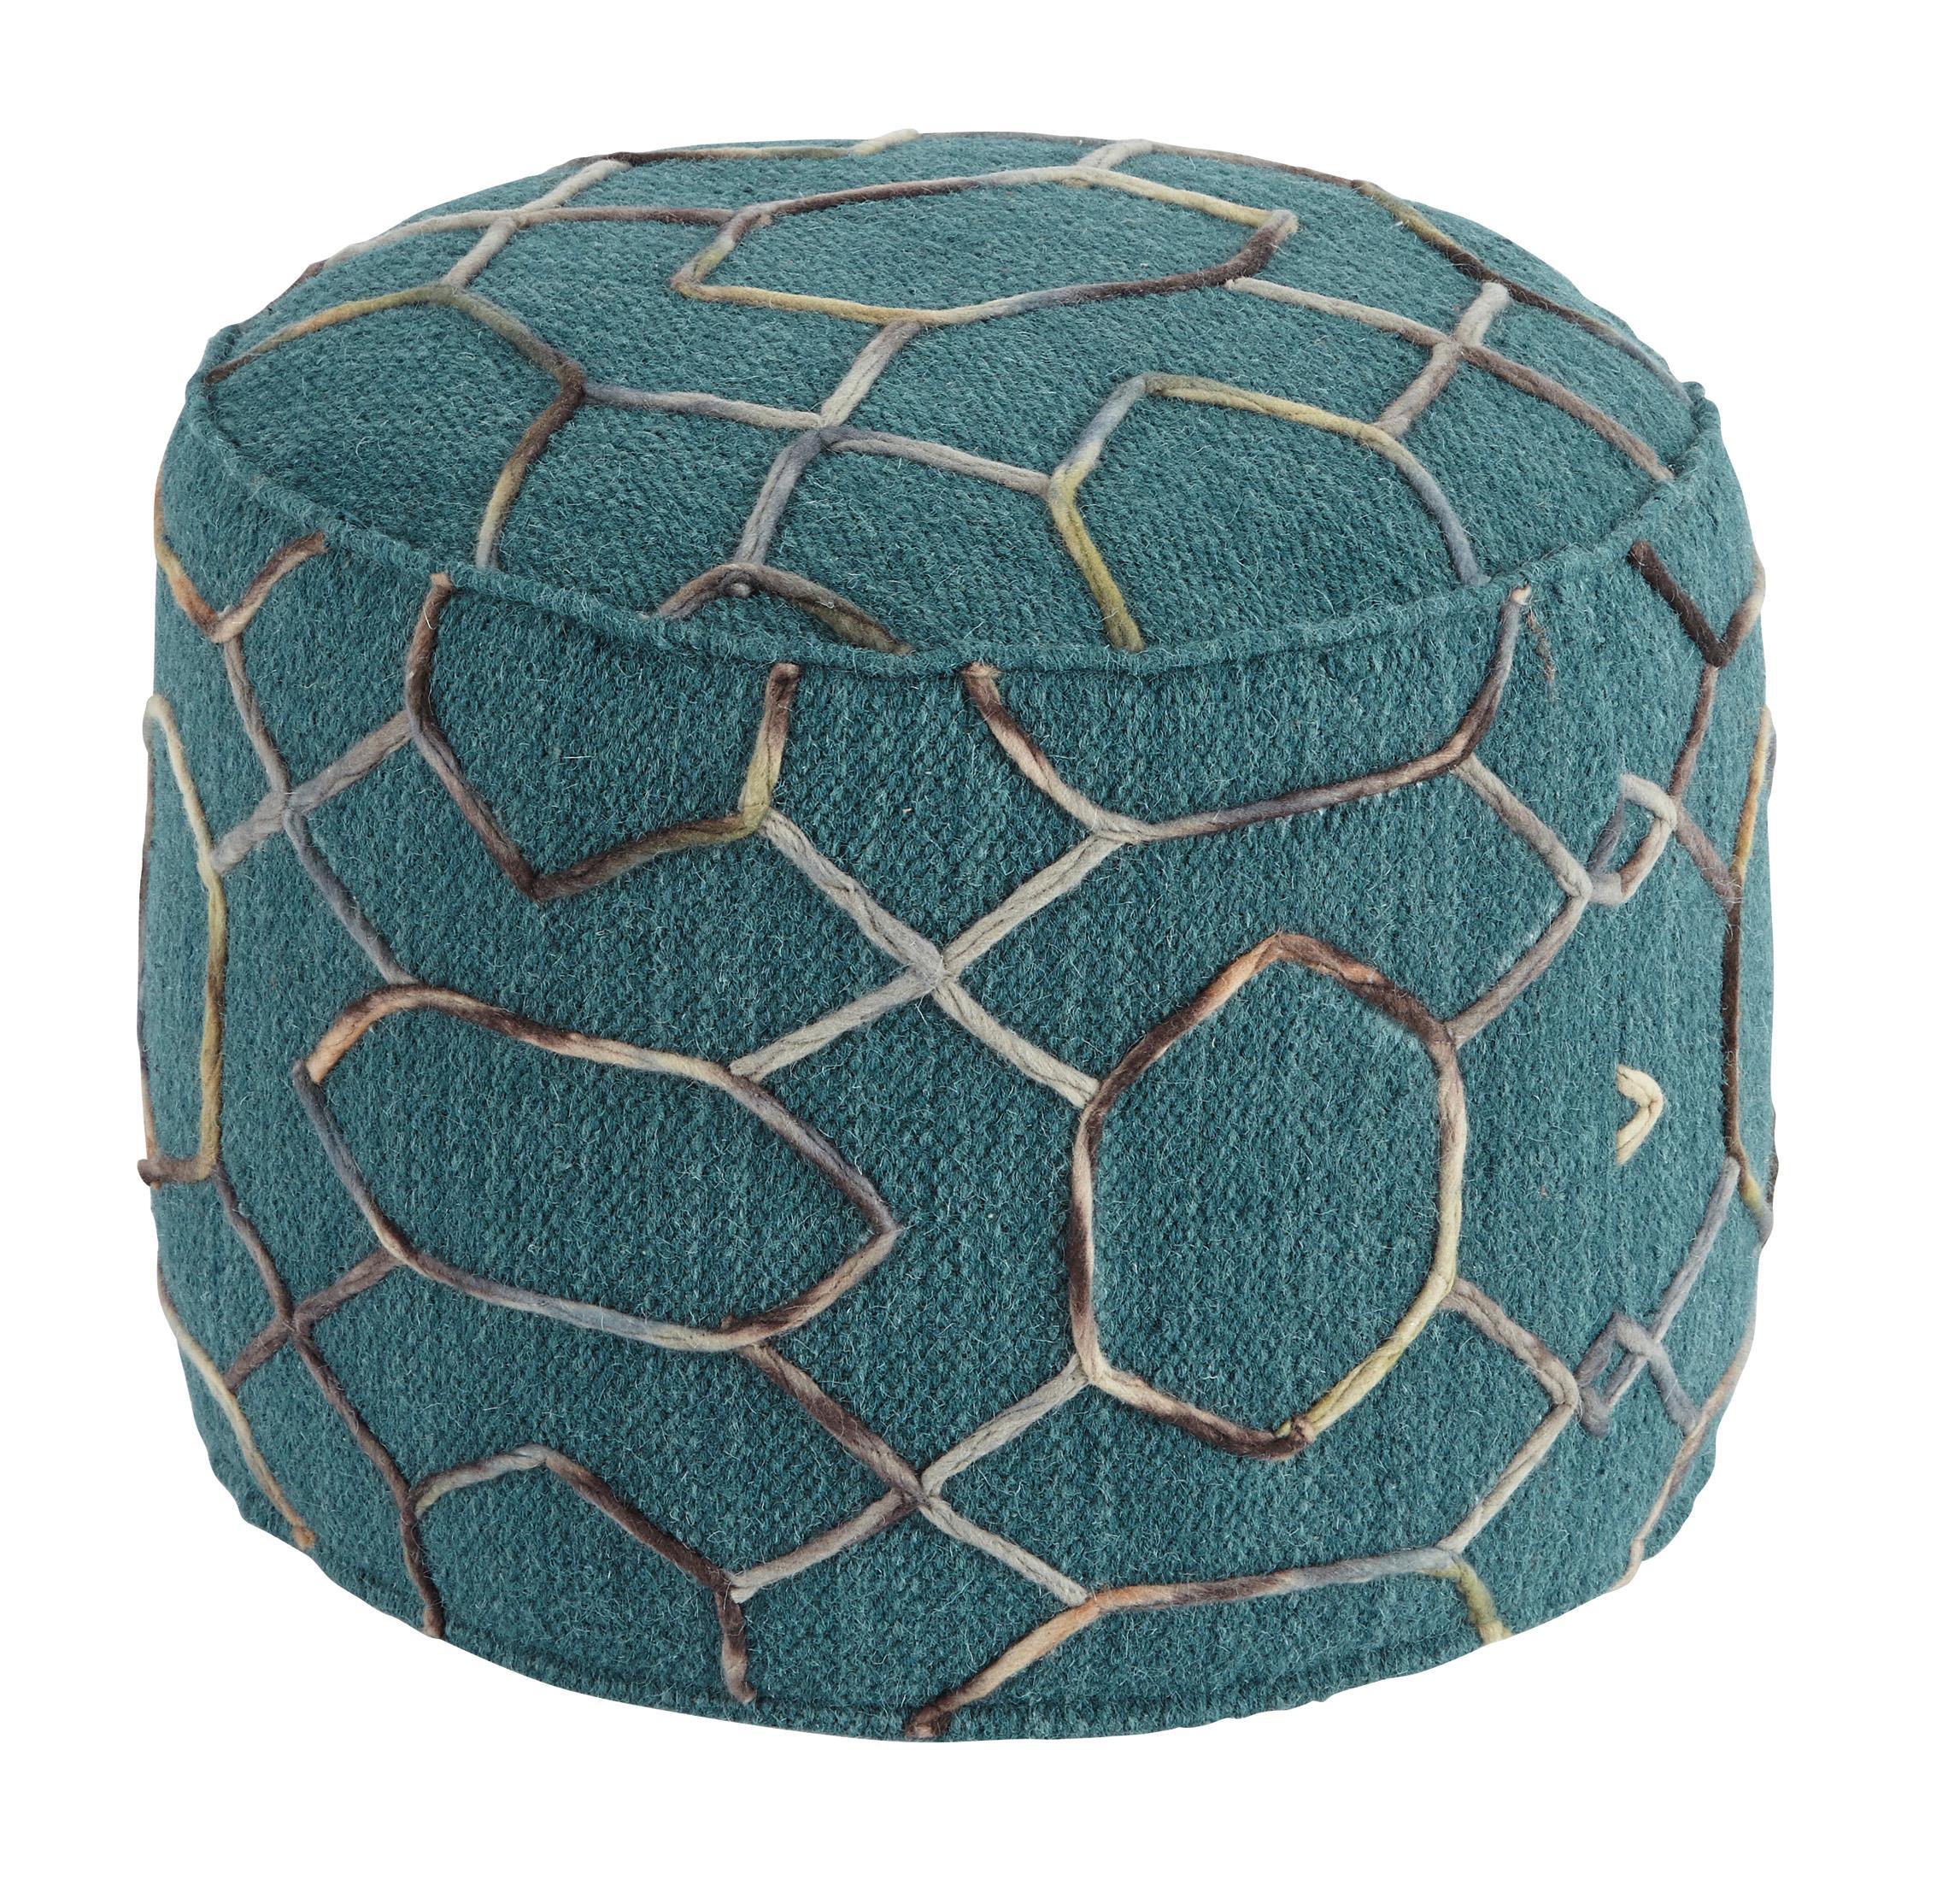 ashley signature design poufs a1000434 overdyed dark. Black Bedroom Furniture Sets. Home Design Ideas